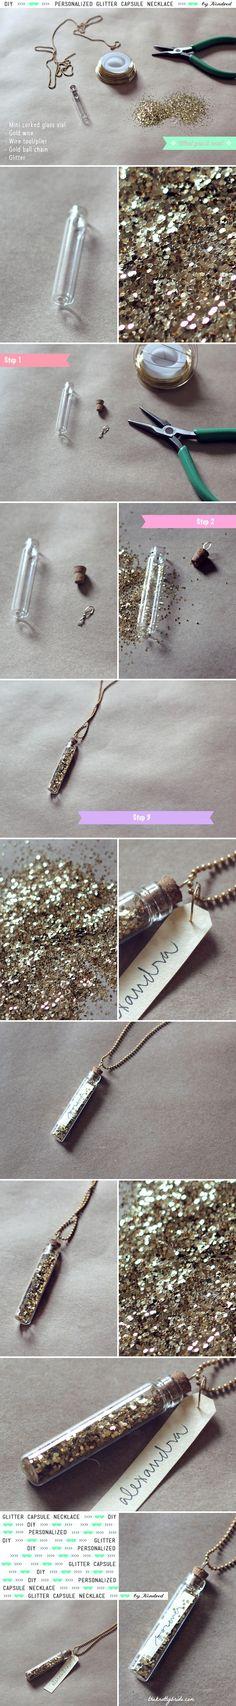 DIY Glitter Necklace, Favor In 1! + The Bachelorette Recap   The Knotty Bride™ Wedding Blog + Wedding Vendor Guide